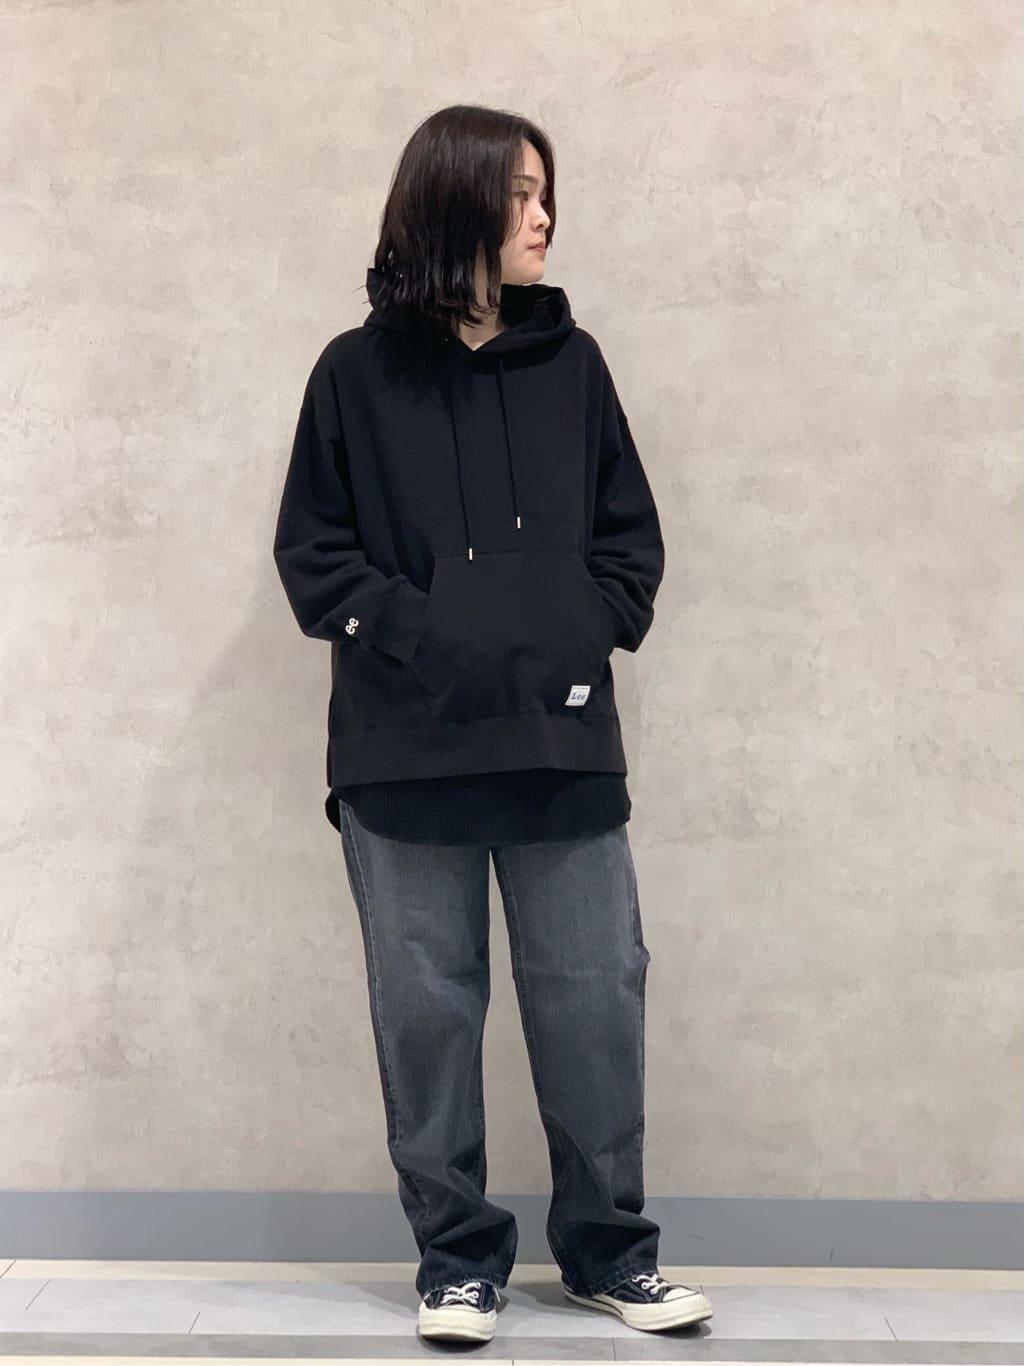 Lee 名古屋店の千さんのLeeの【otonaMUSE掲載】【毎日履きたい】ボーイズストレートパンツを使ったコーディネート